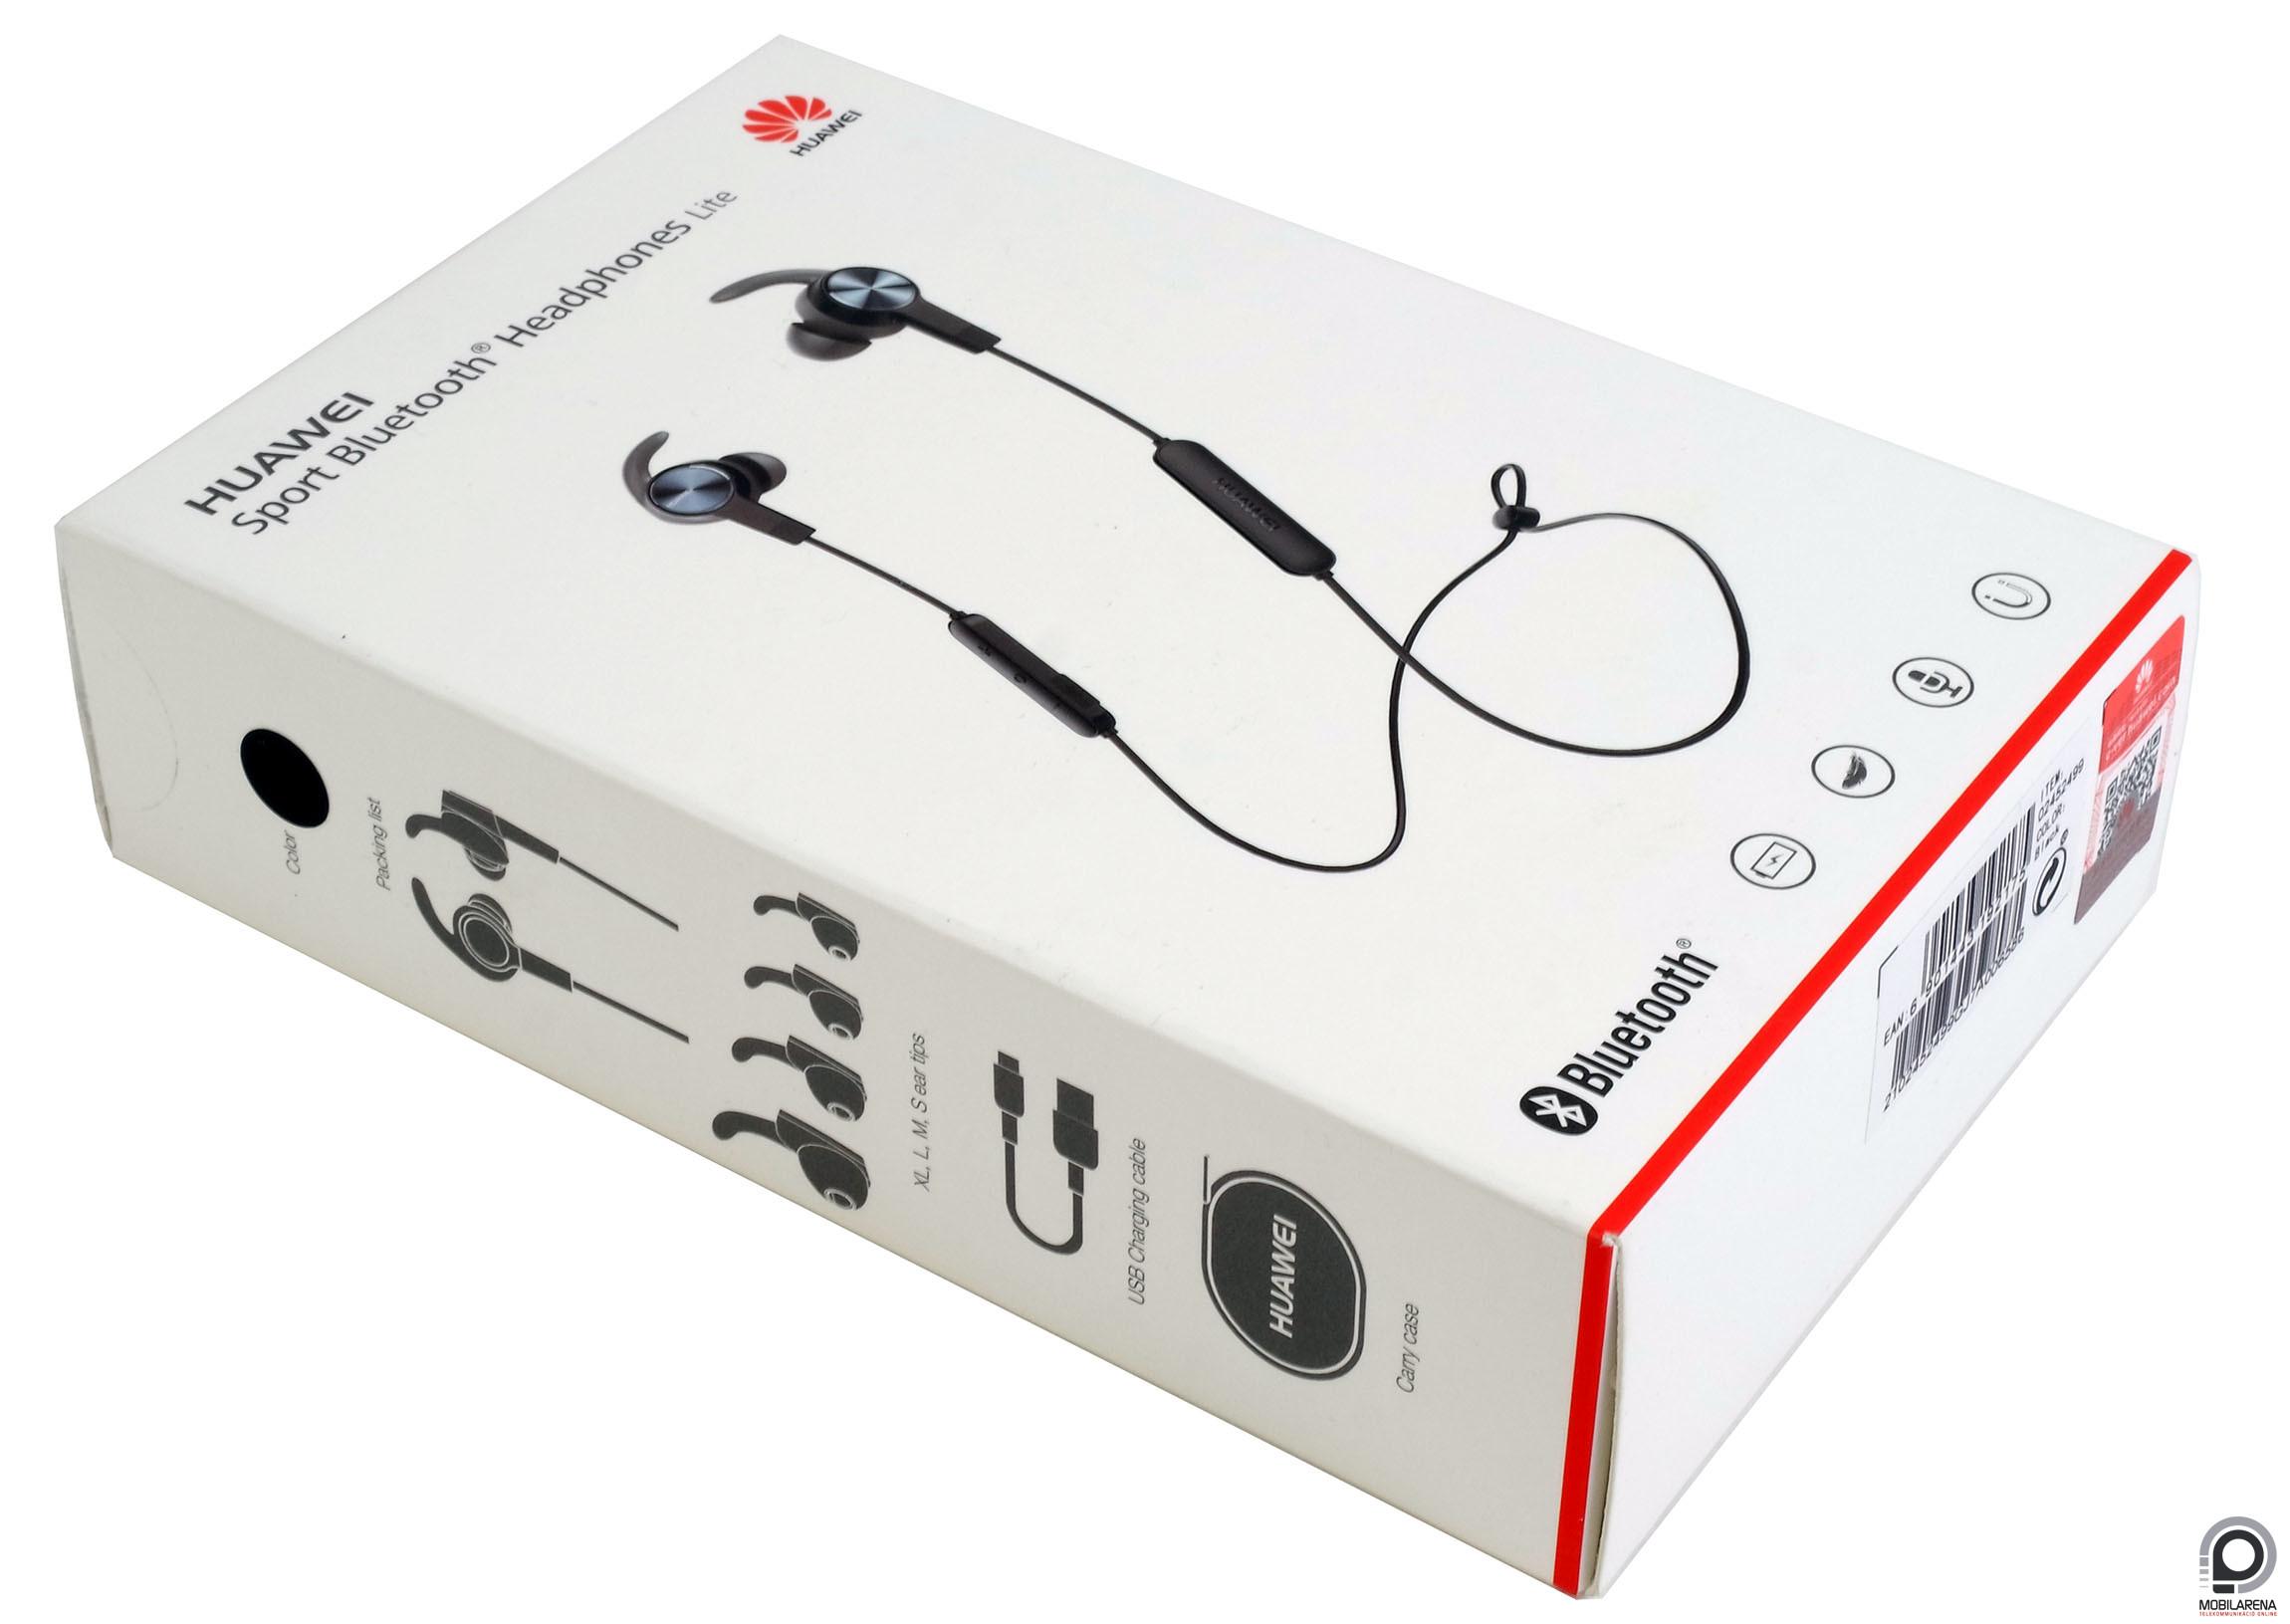 Huawei Sport Headphones Lite teszt - Mobilarena Tartozékok teszt 1006536e66